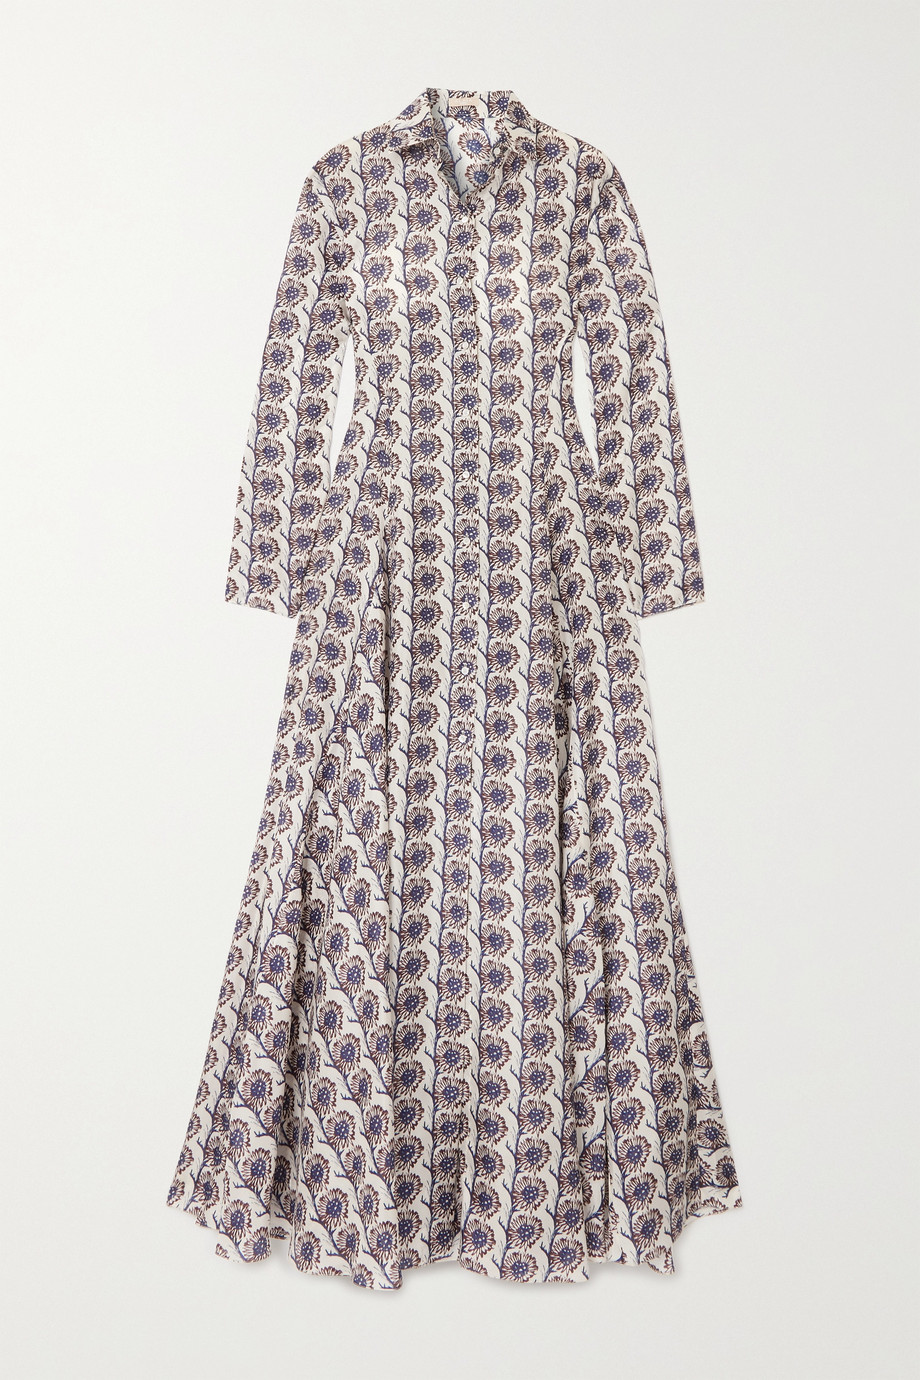 Alaïa Floral-print silk crepe de chine shirt dress